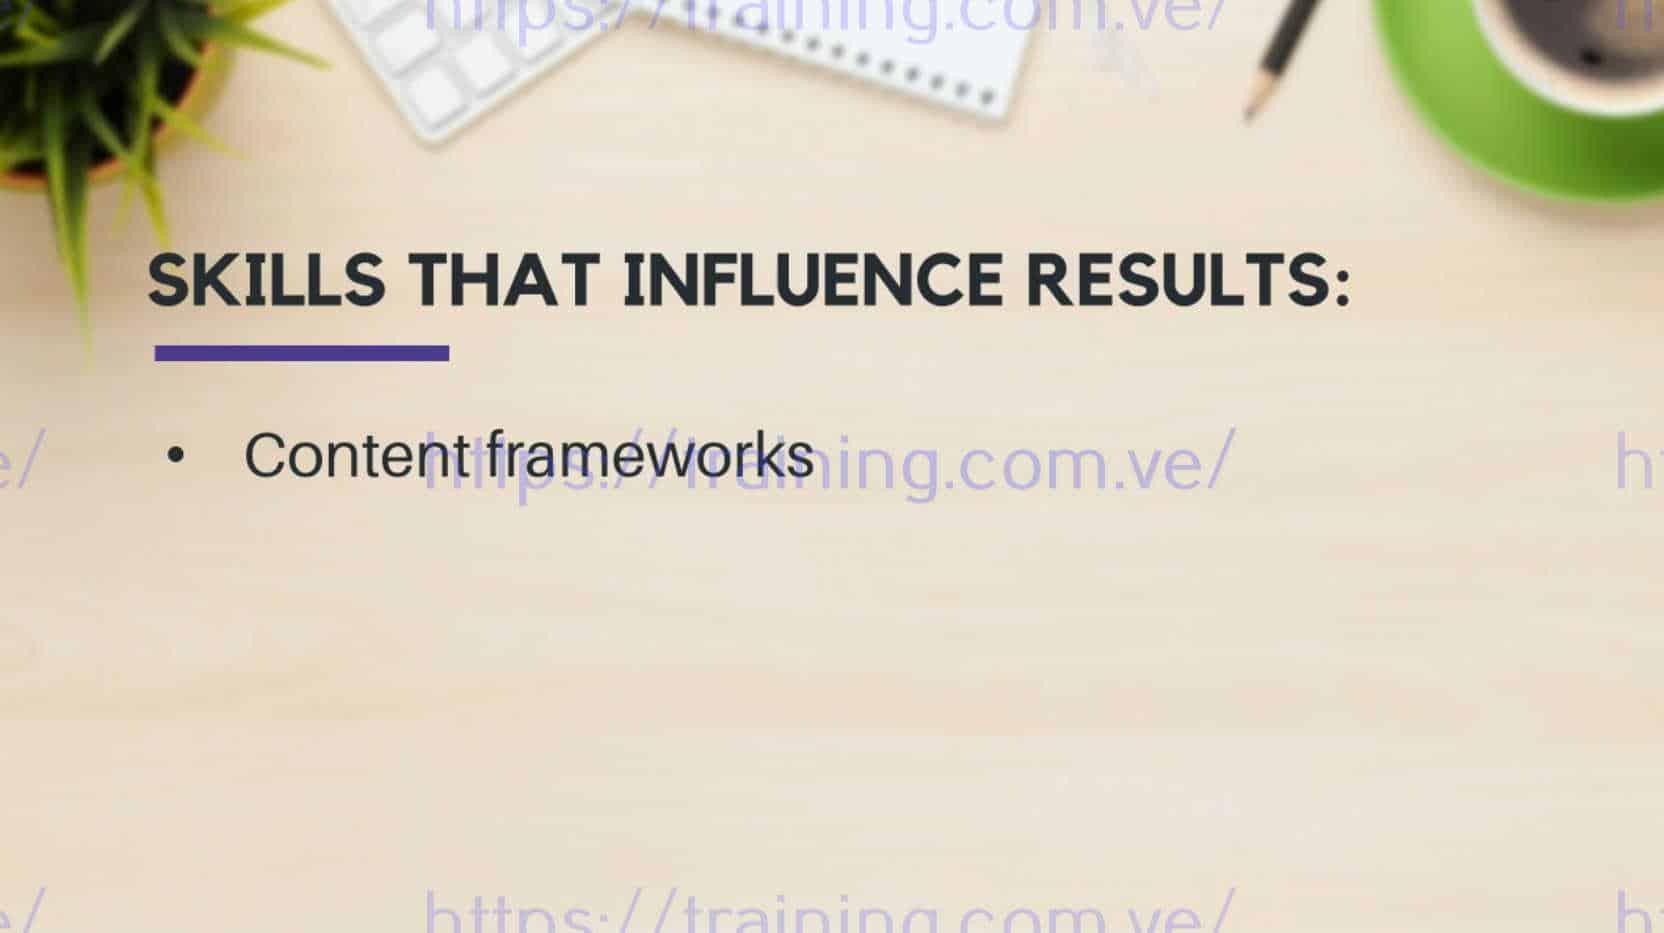 Content Marketing Certification by Jon Morrow Free